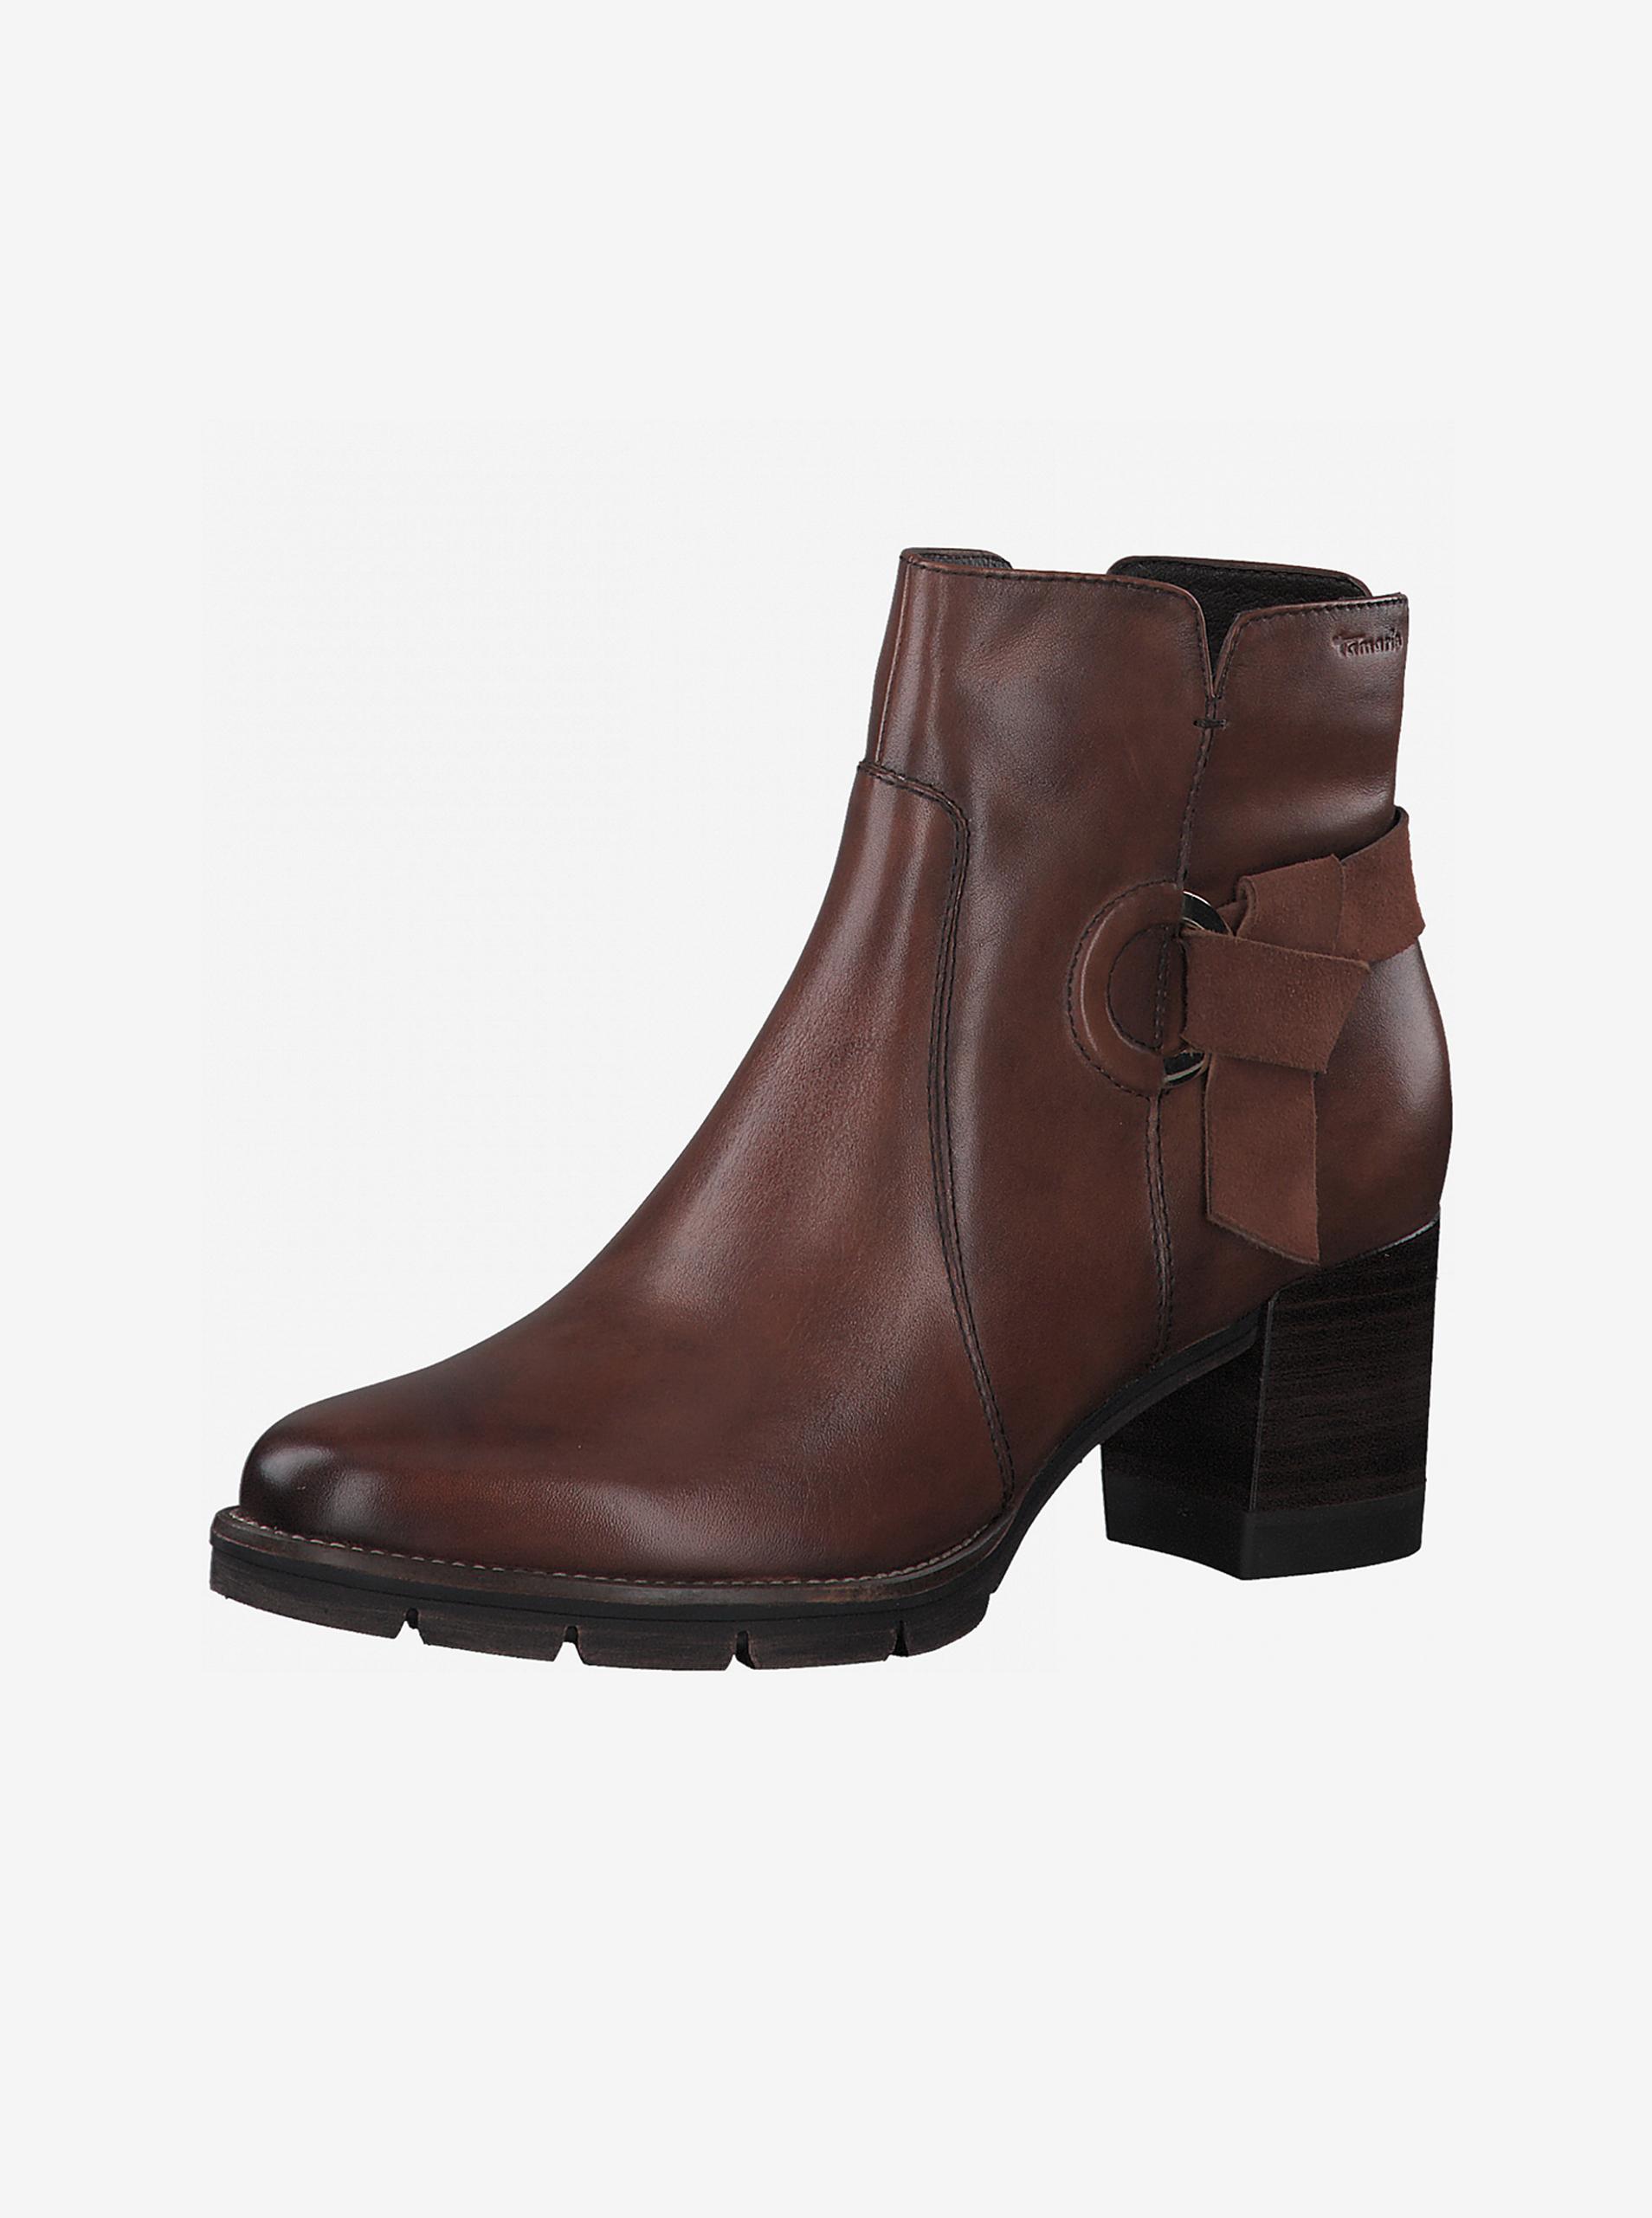 Tamaris hnedé členkové kožené topánky na podpätku - 36